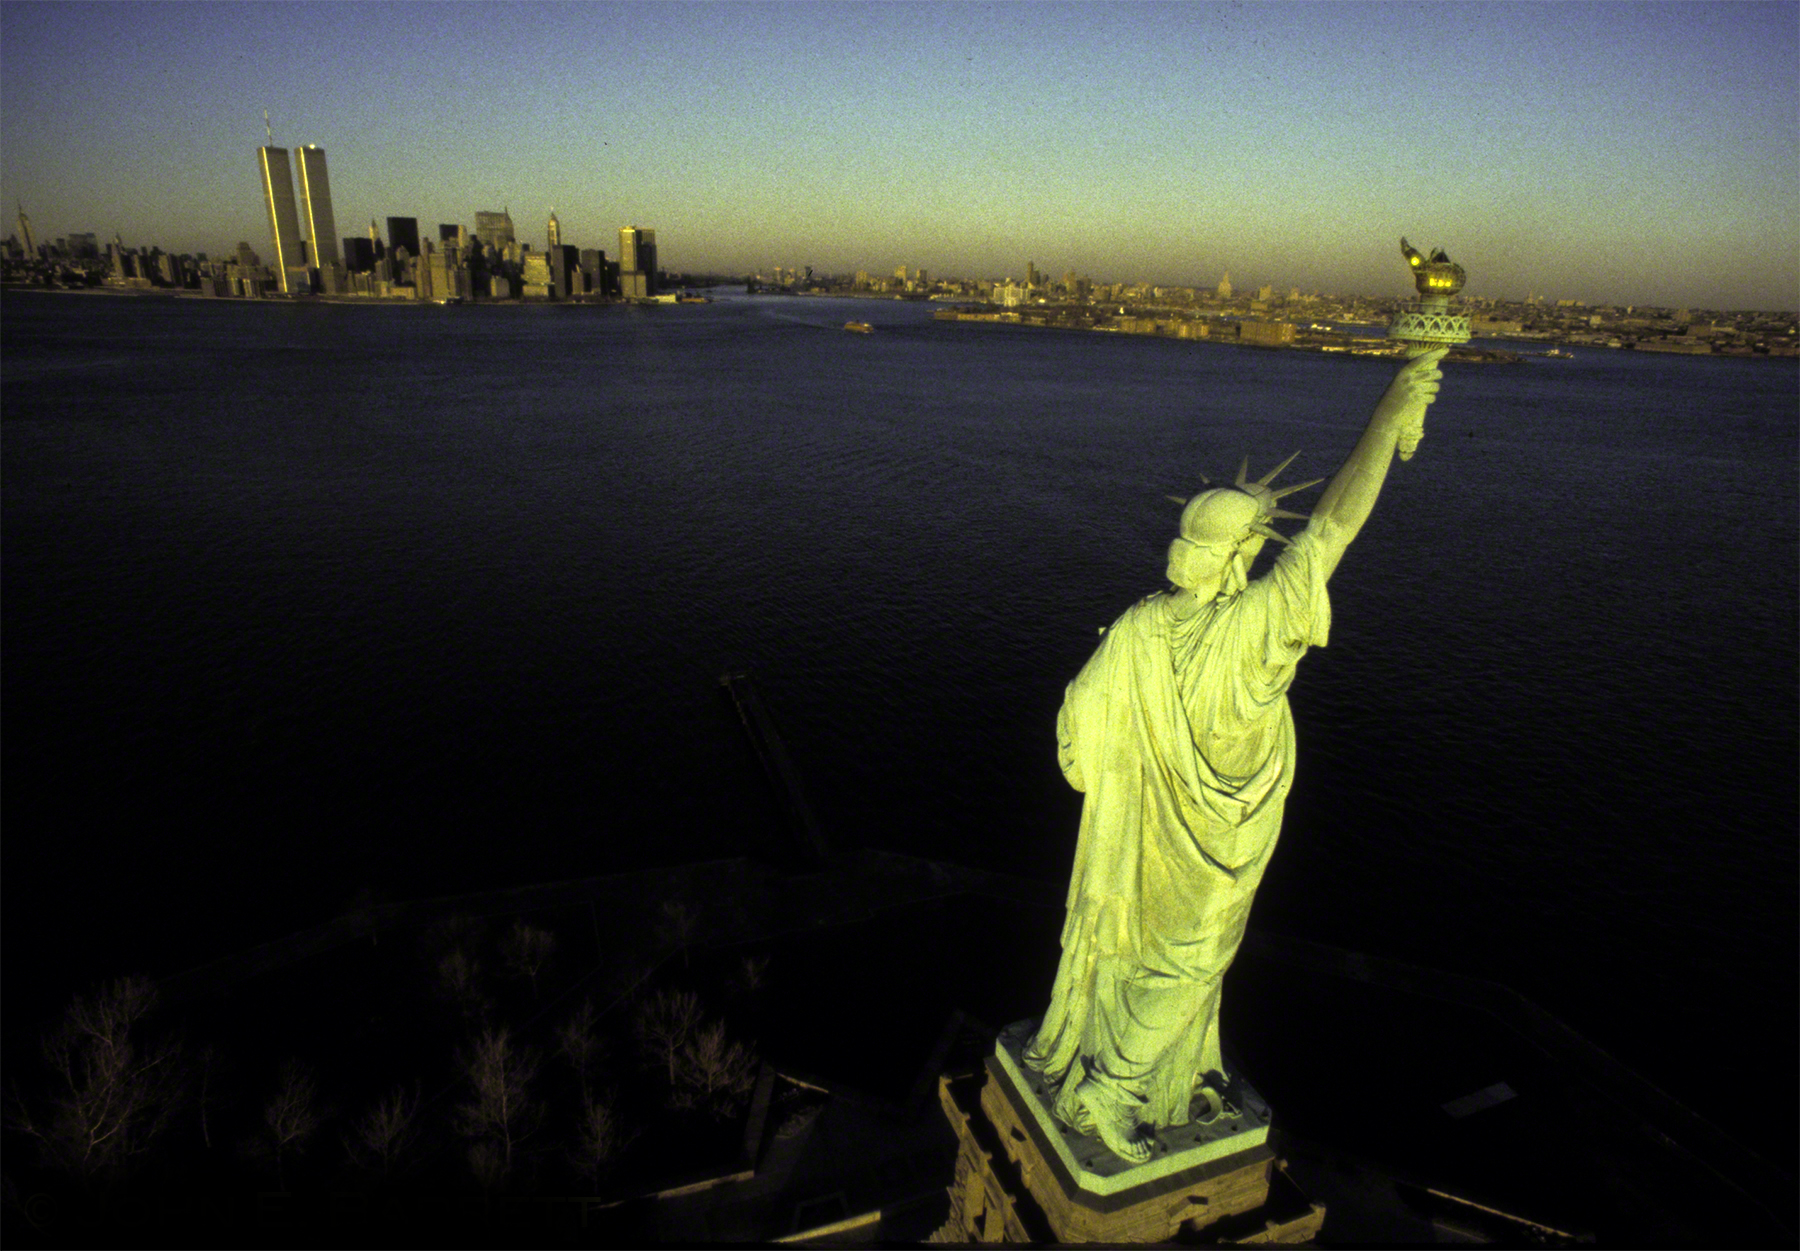 statuen of liberty.jpg